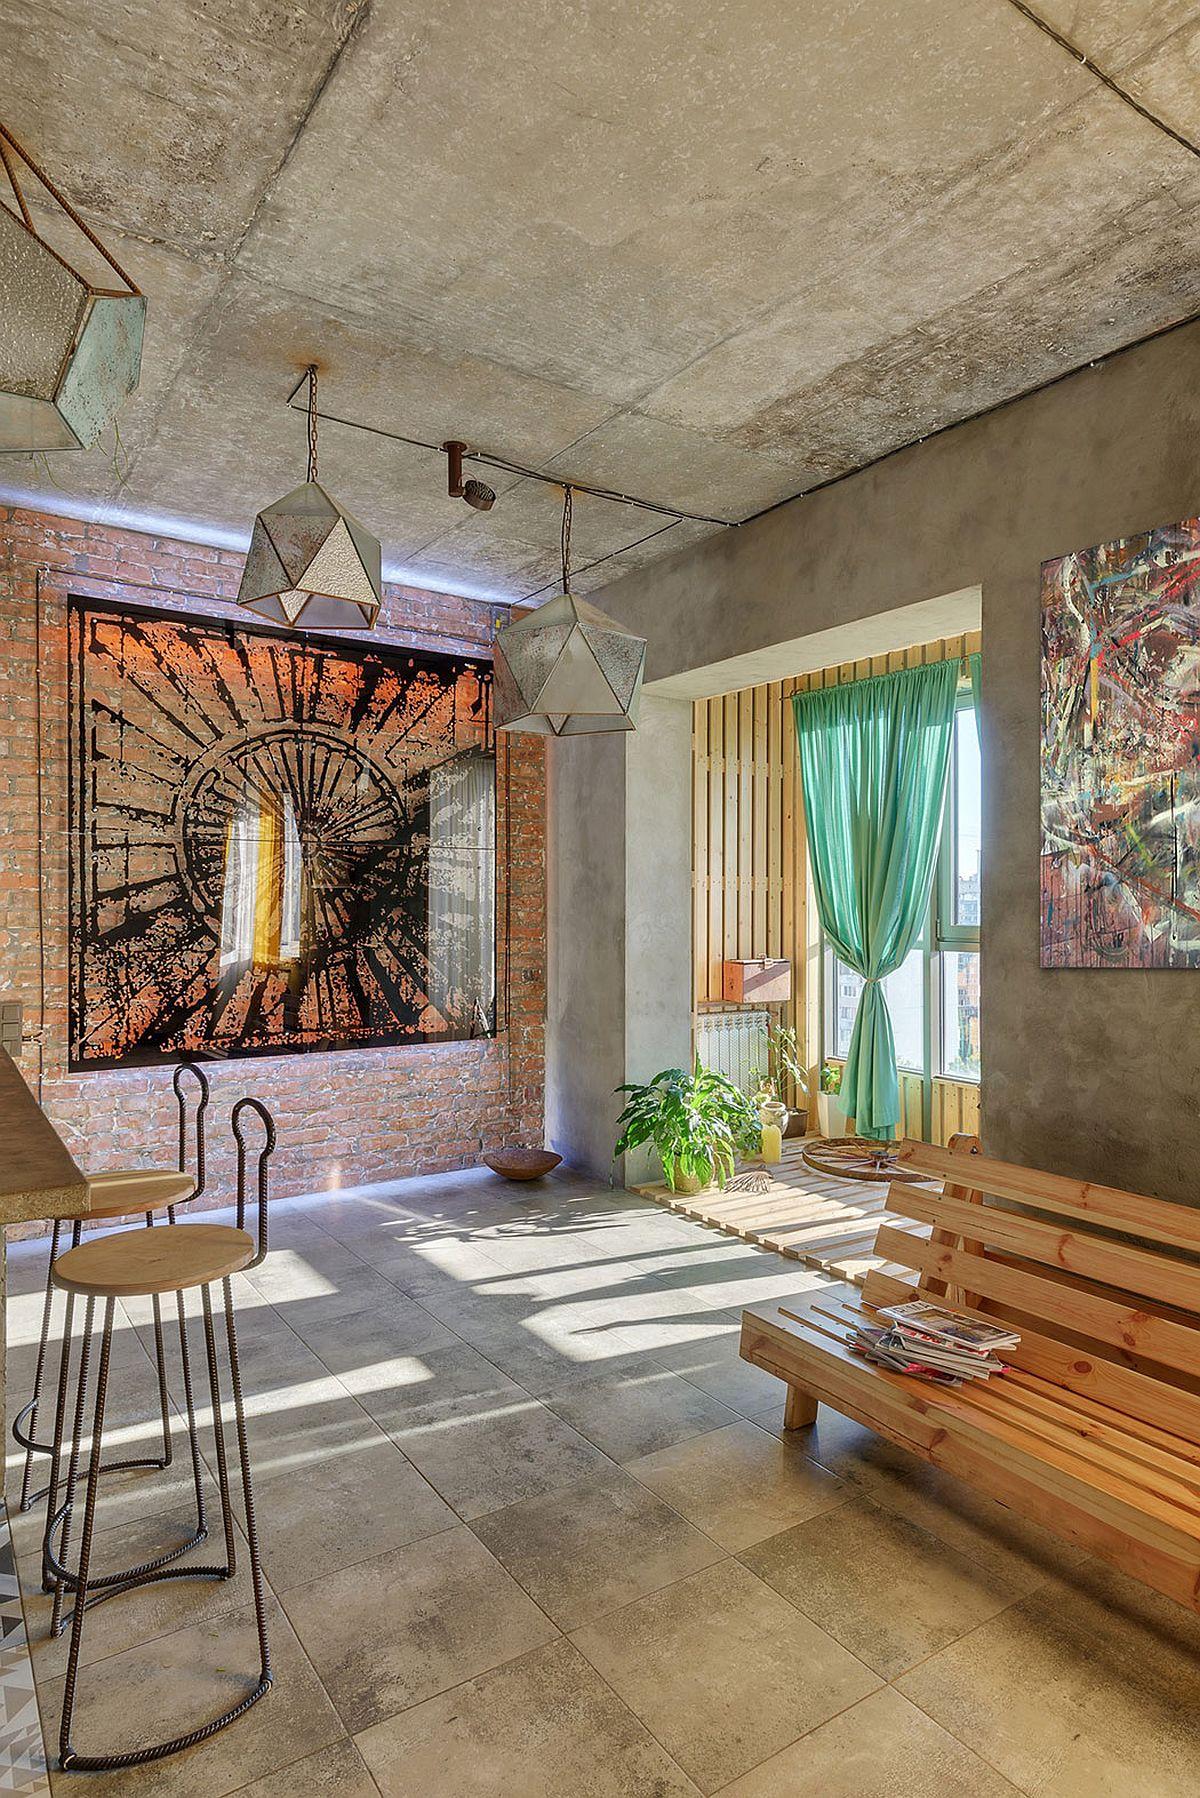 Exposed concrete, rebar, and metal oxide create a cozy and unique interior